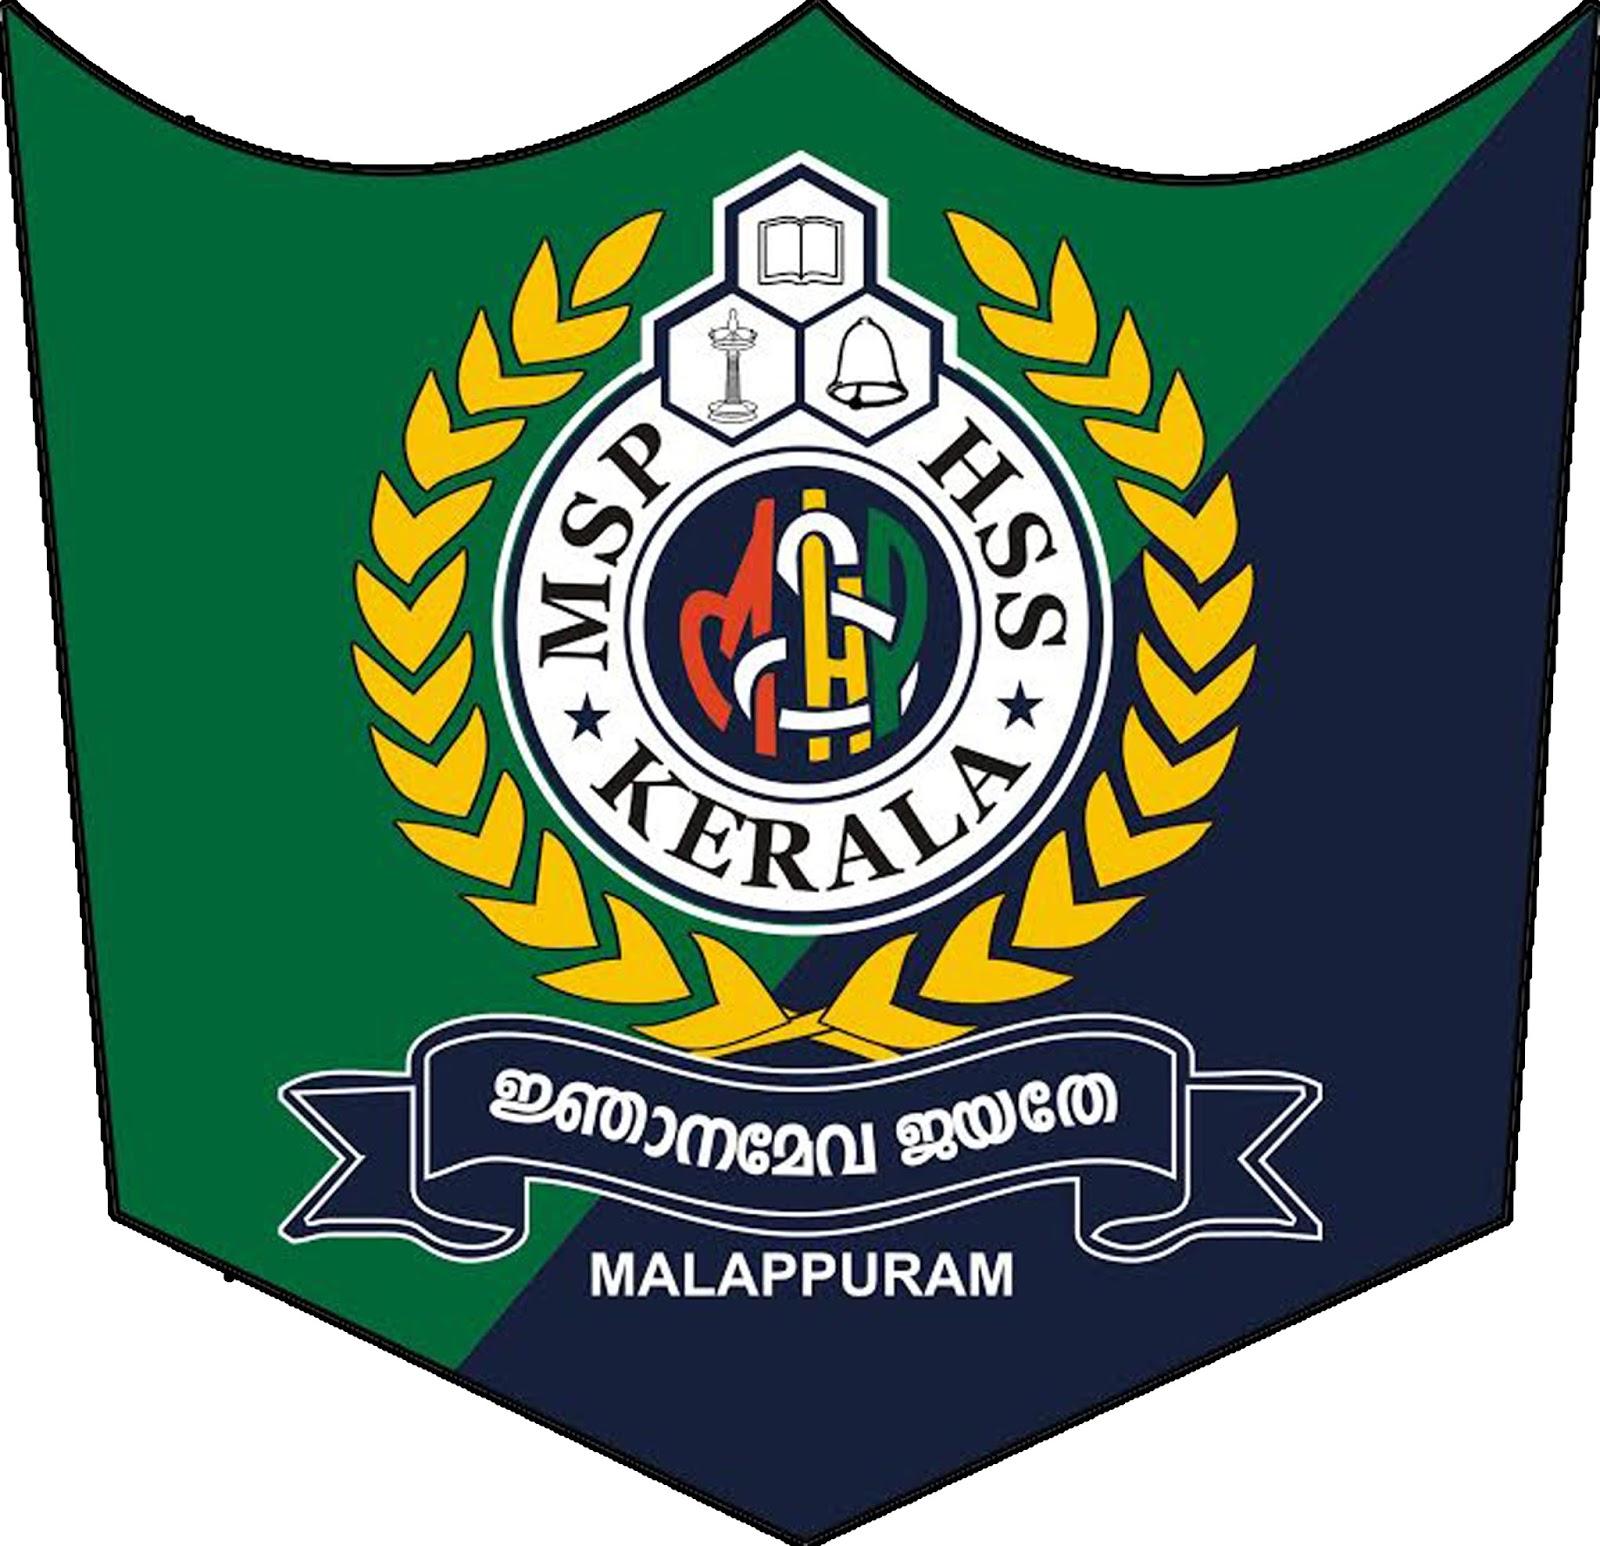 LOGO OF MSPHSS MALAPPURAM